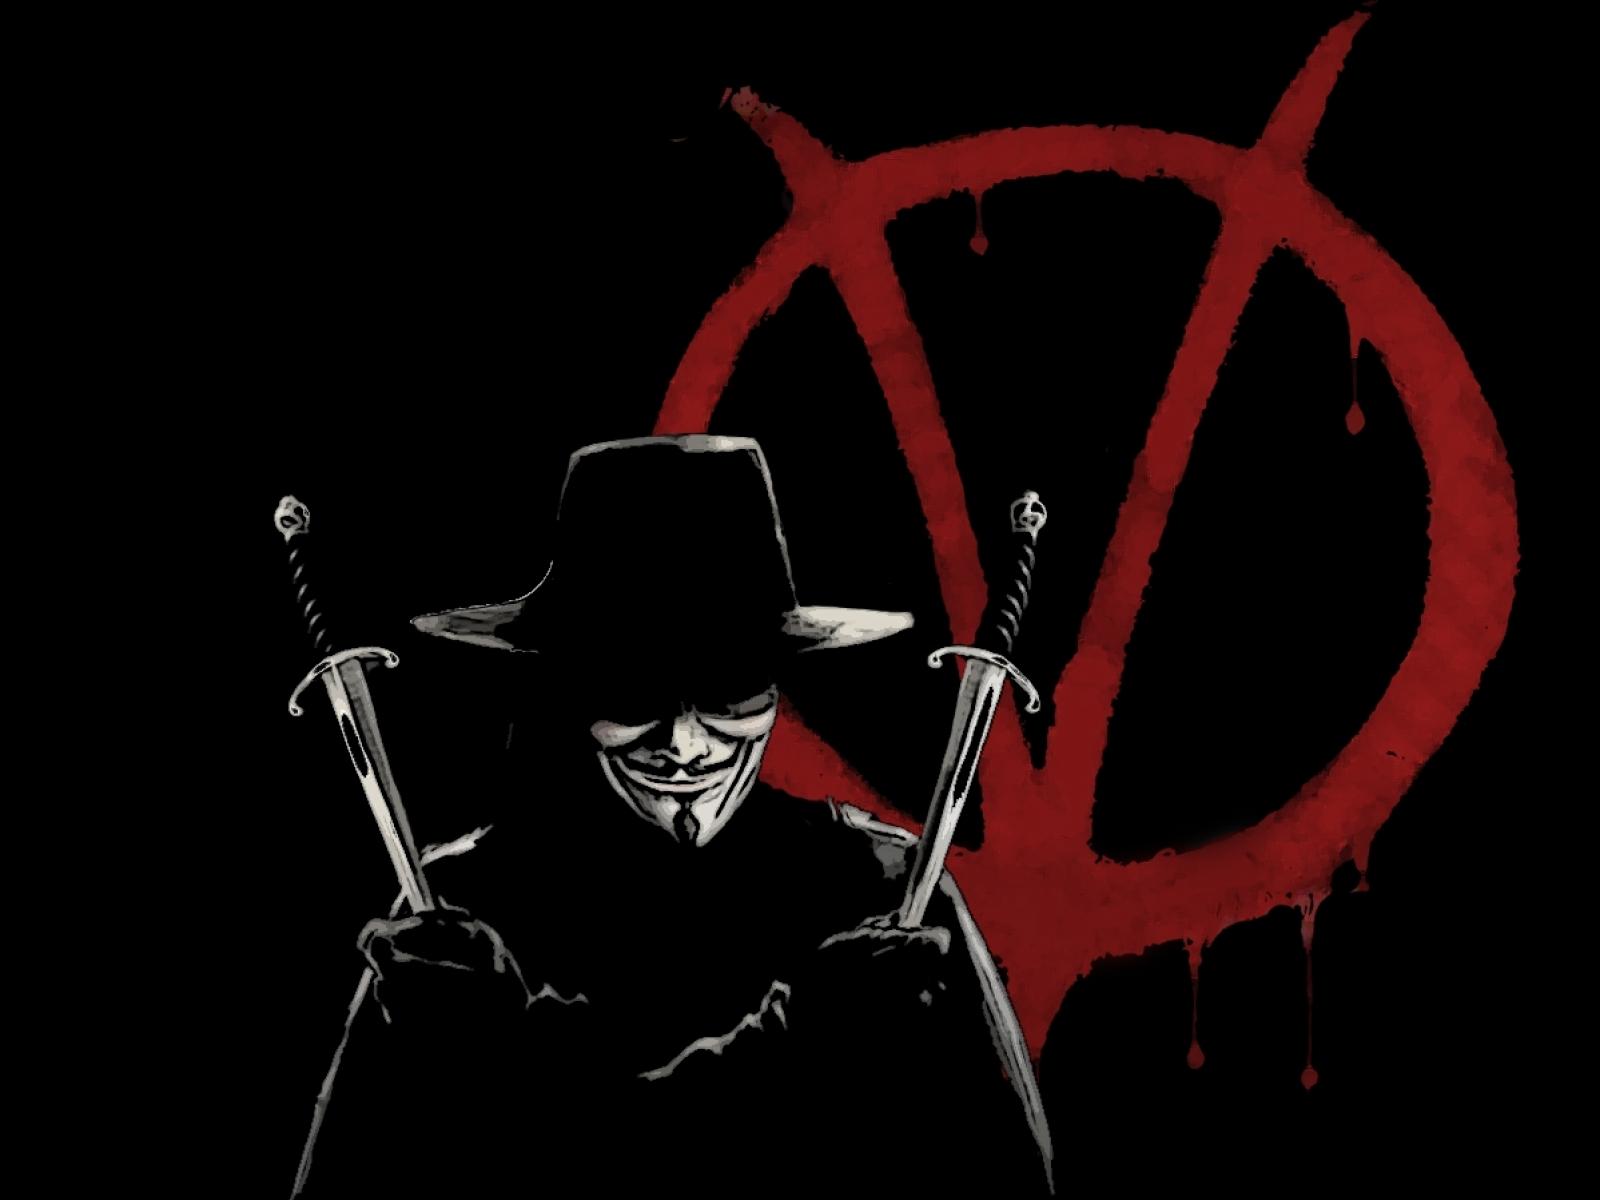 74] V For Vendetta Wallpaper Hd on WallpaperSafari 1600x1200